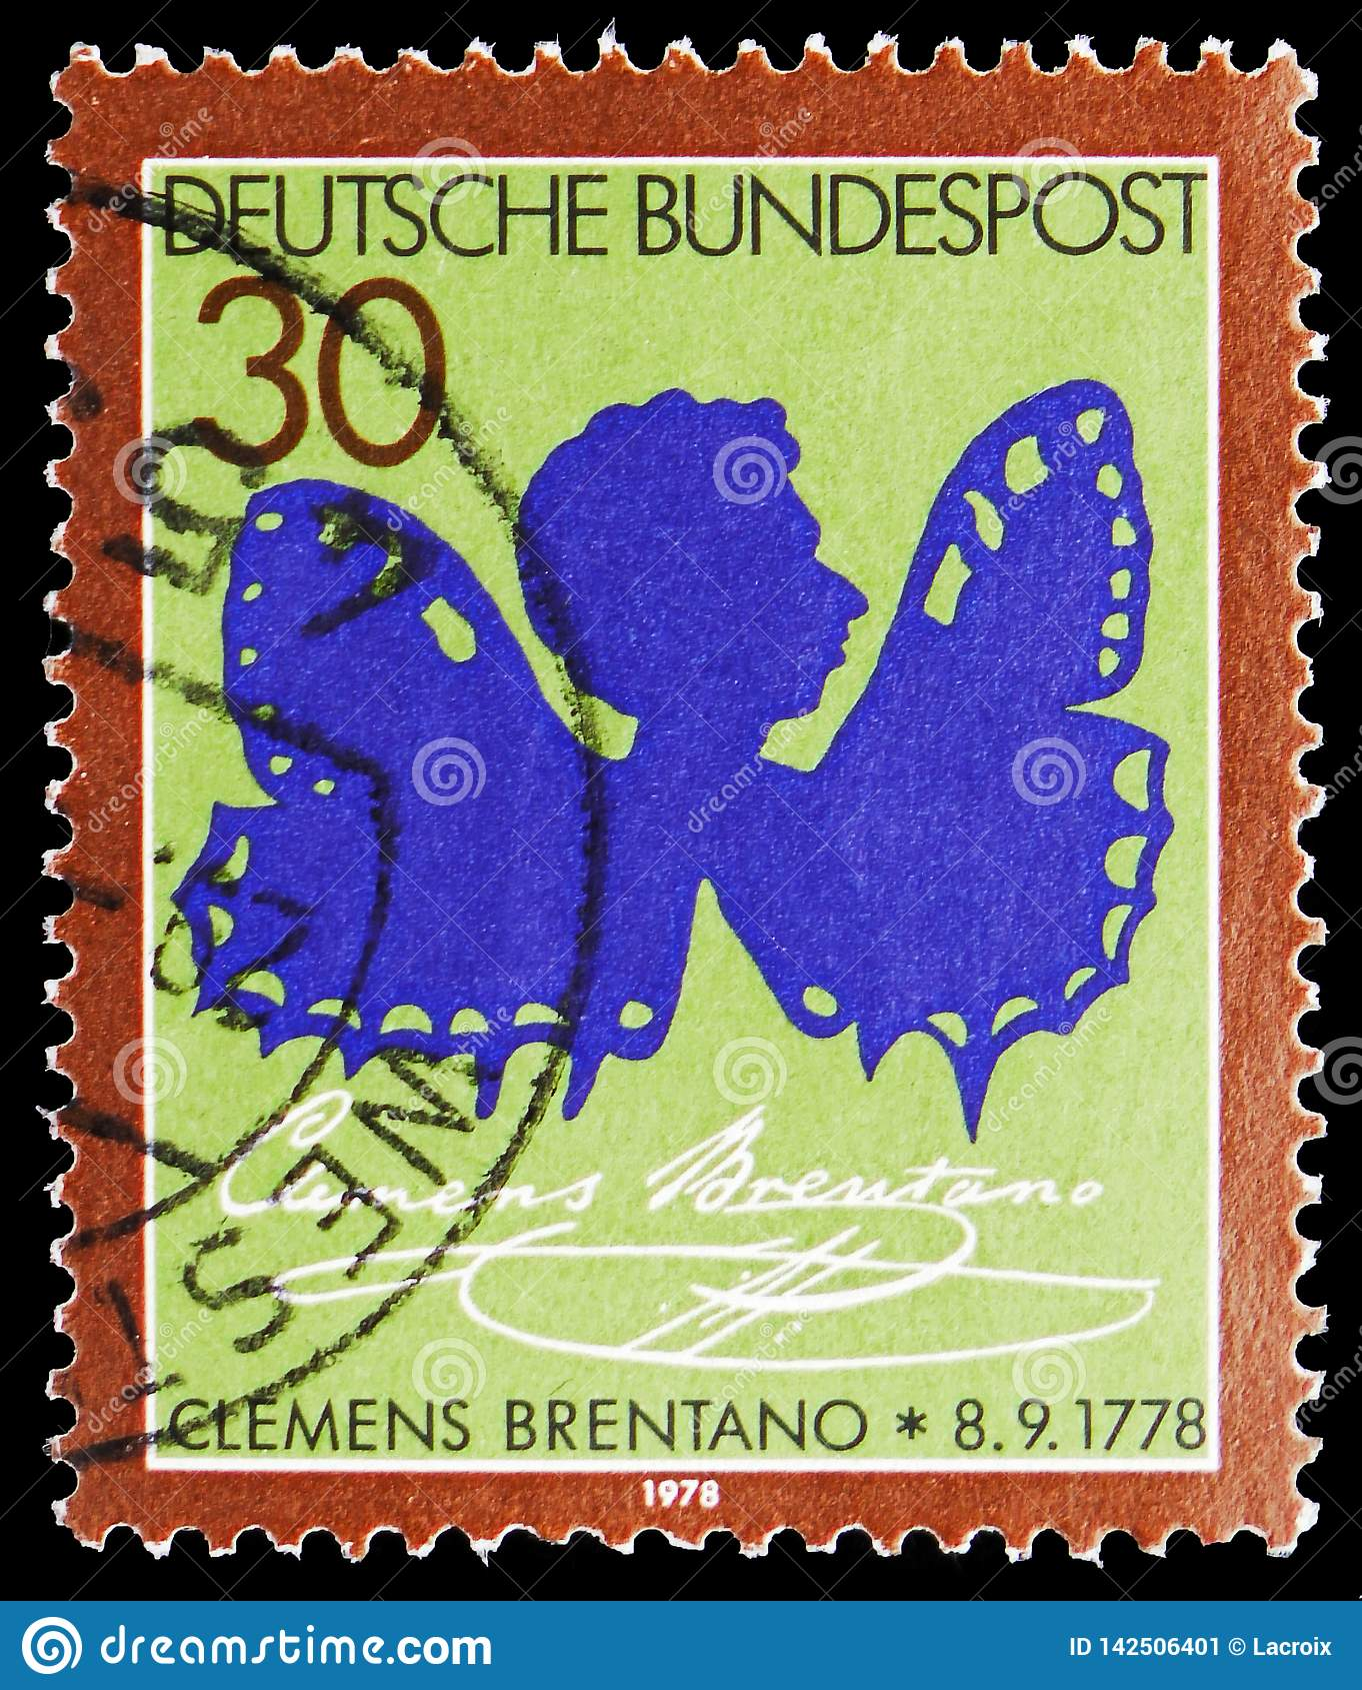 Clemens Brentano, Birth Bicentenary of Clemens Brentano serie, circa 1978